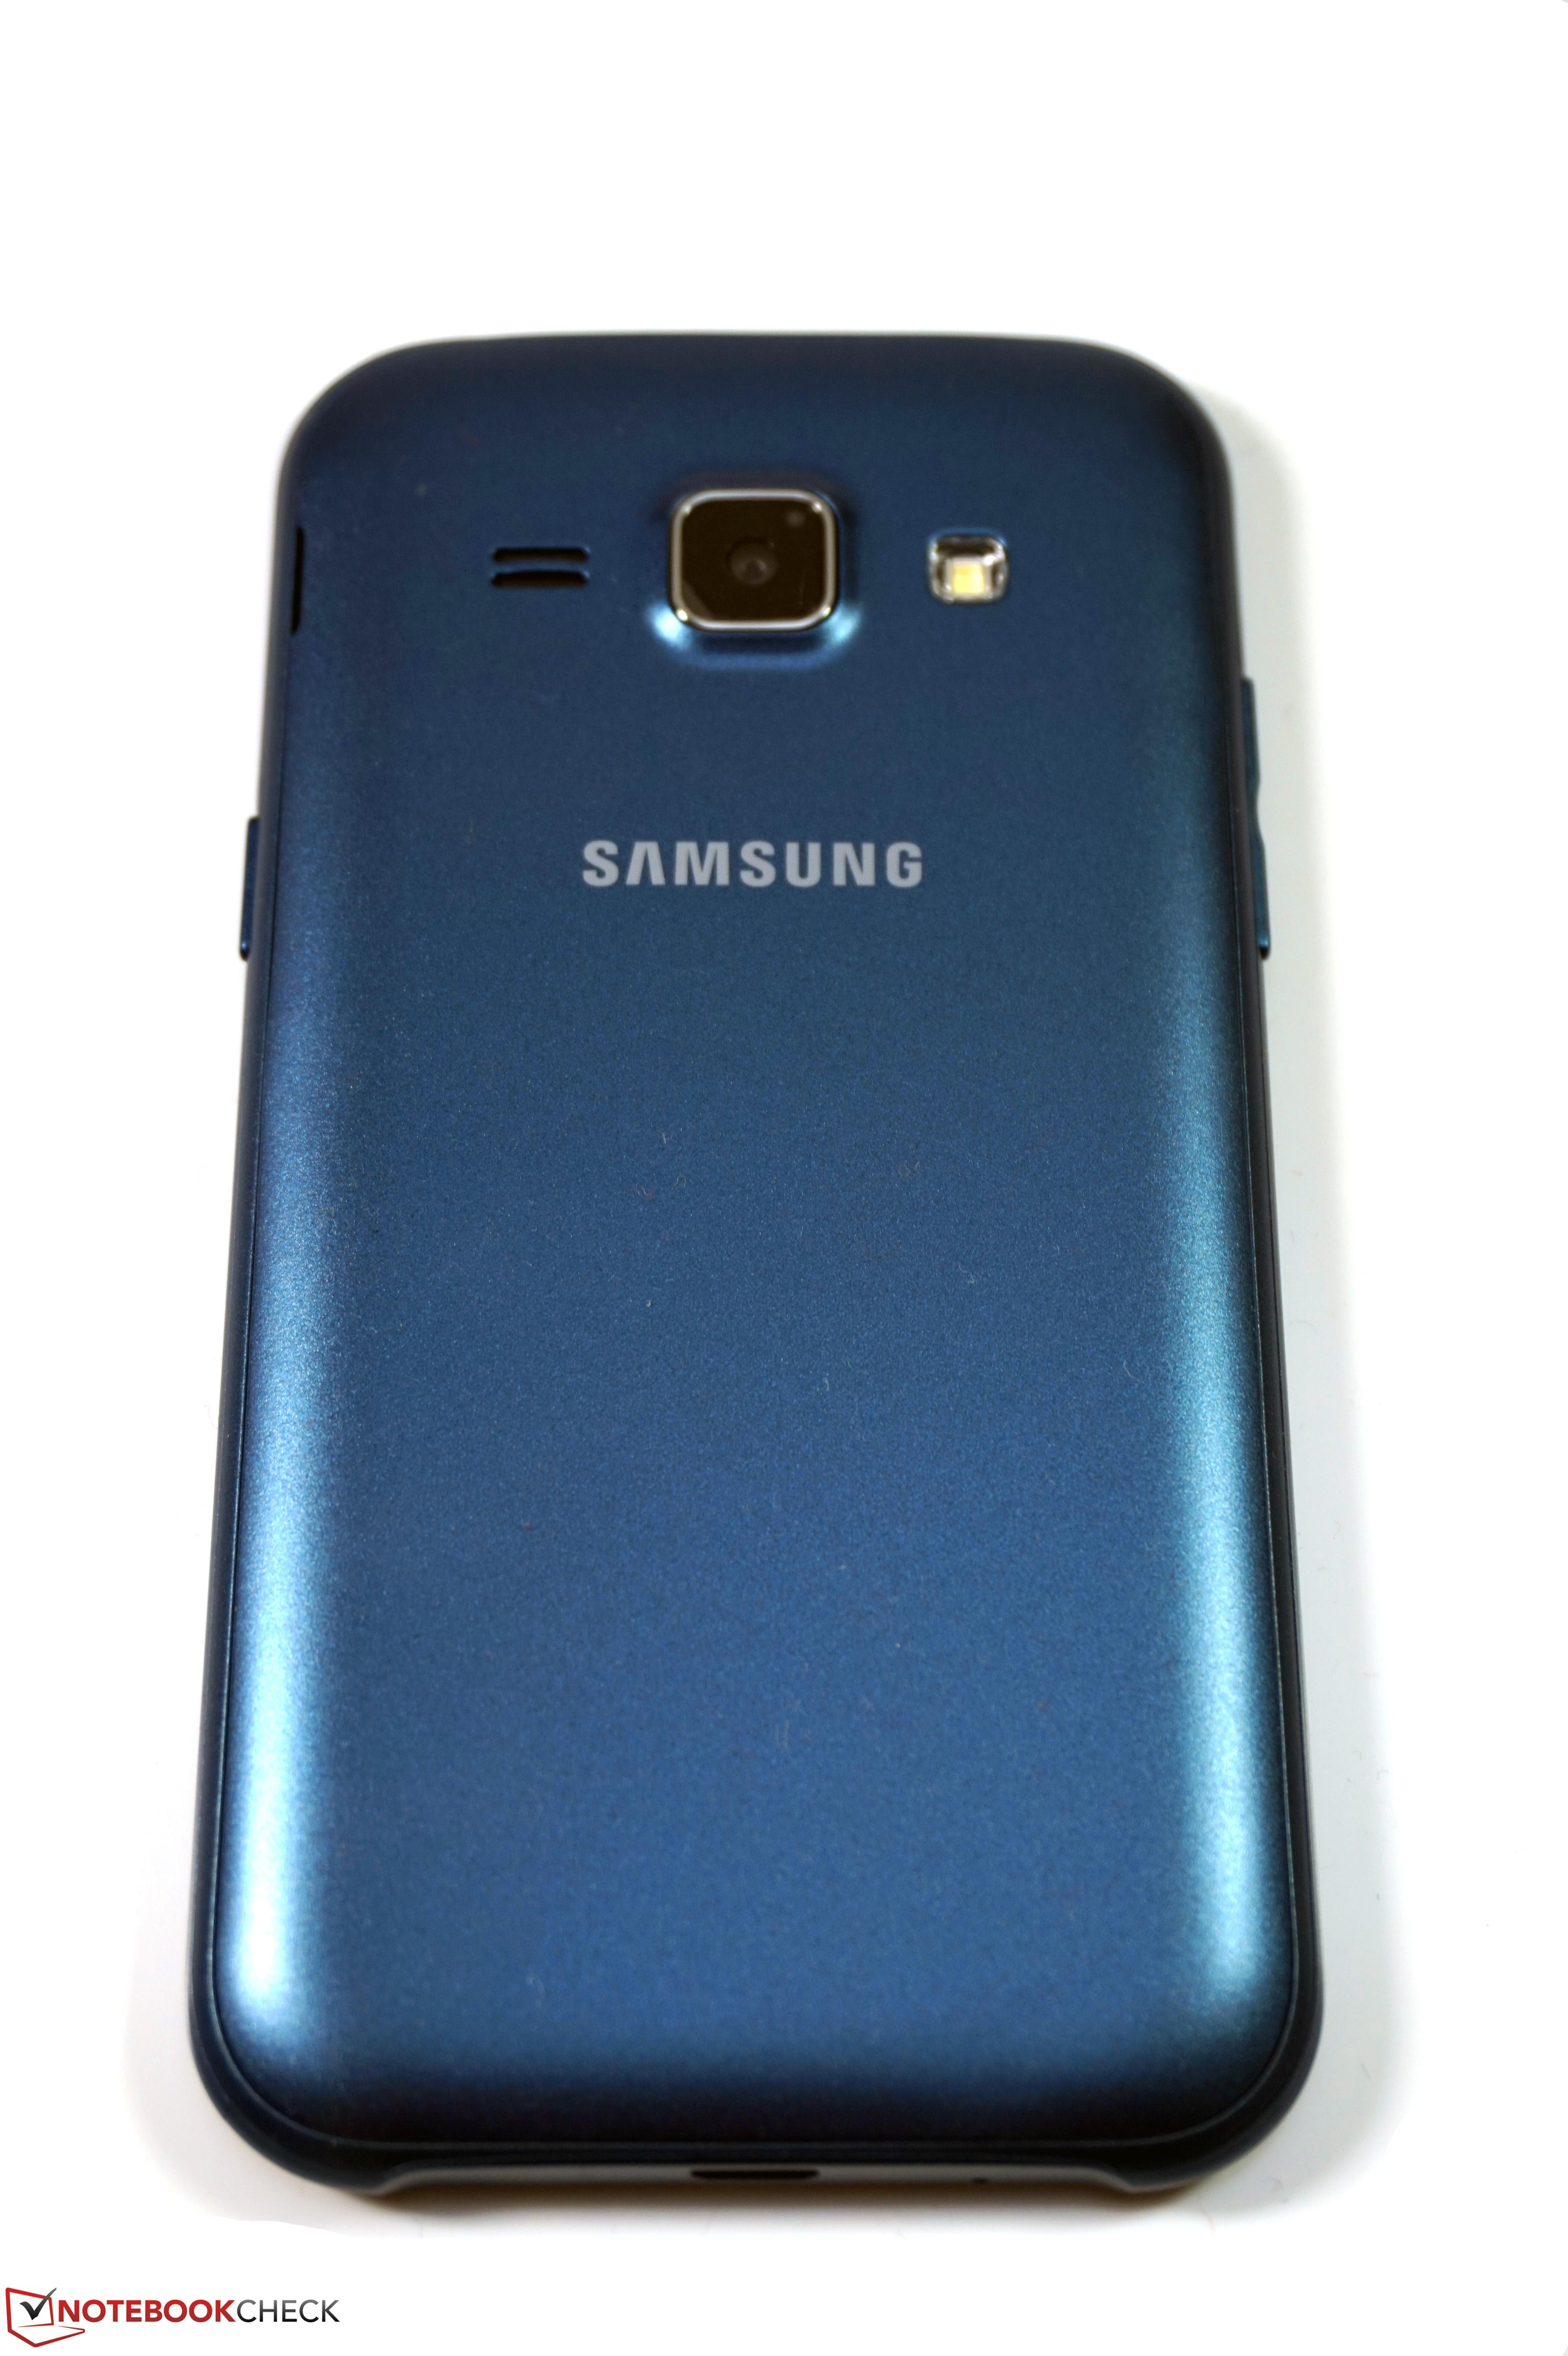 Trail Camera Reviews >> Samsung Galaxy J1 Smartphone Review - NotebookCheck.net Reviews